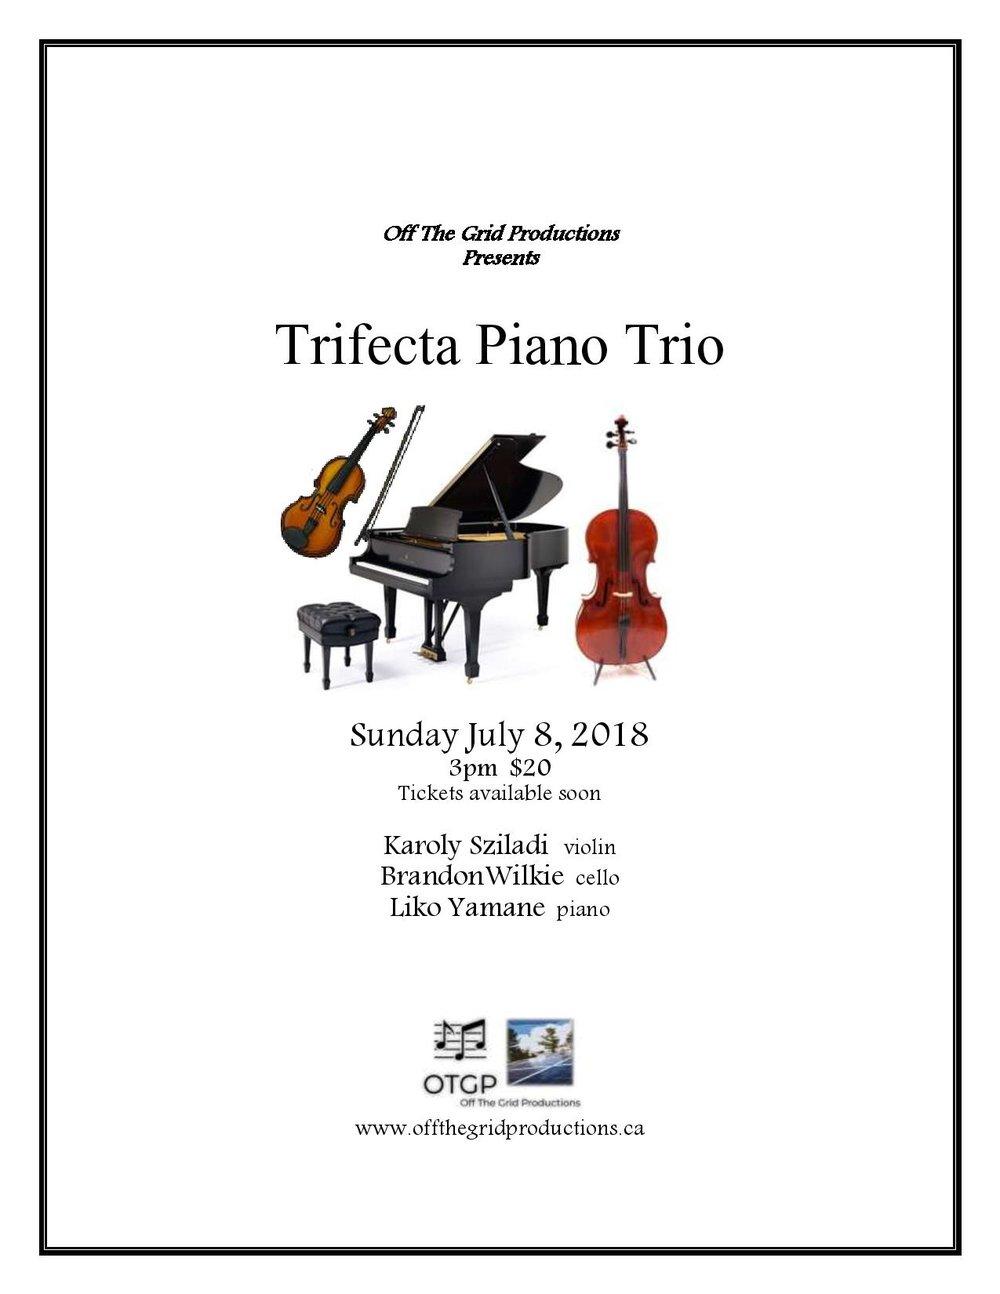 Trifecta Piano Trio - Liko Yamane pianoKaroly Sziladi violinBrandon Wilkie cello